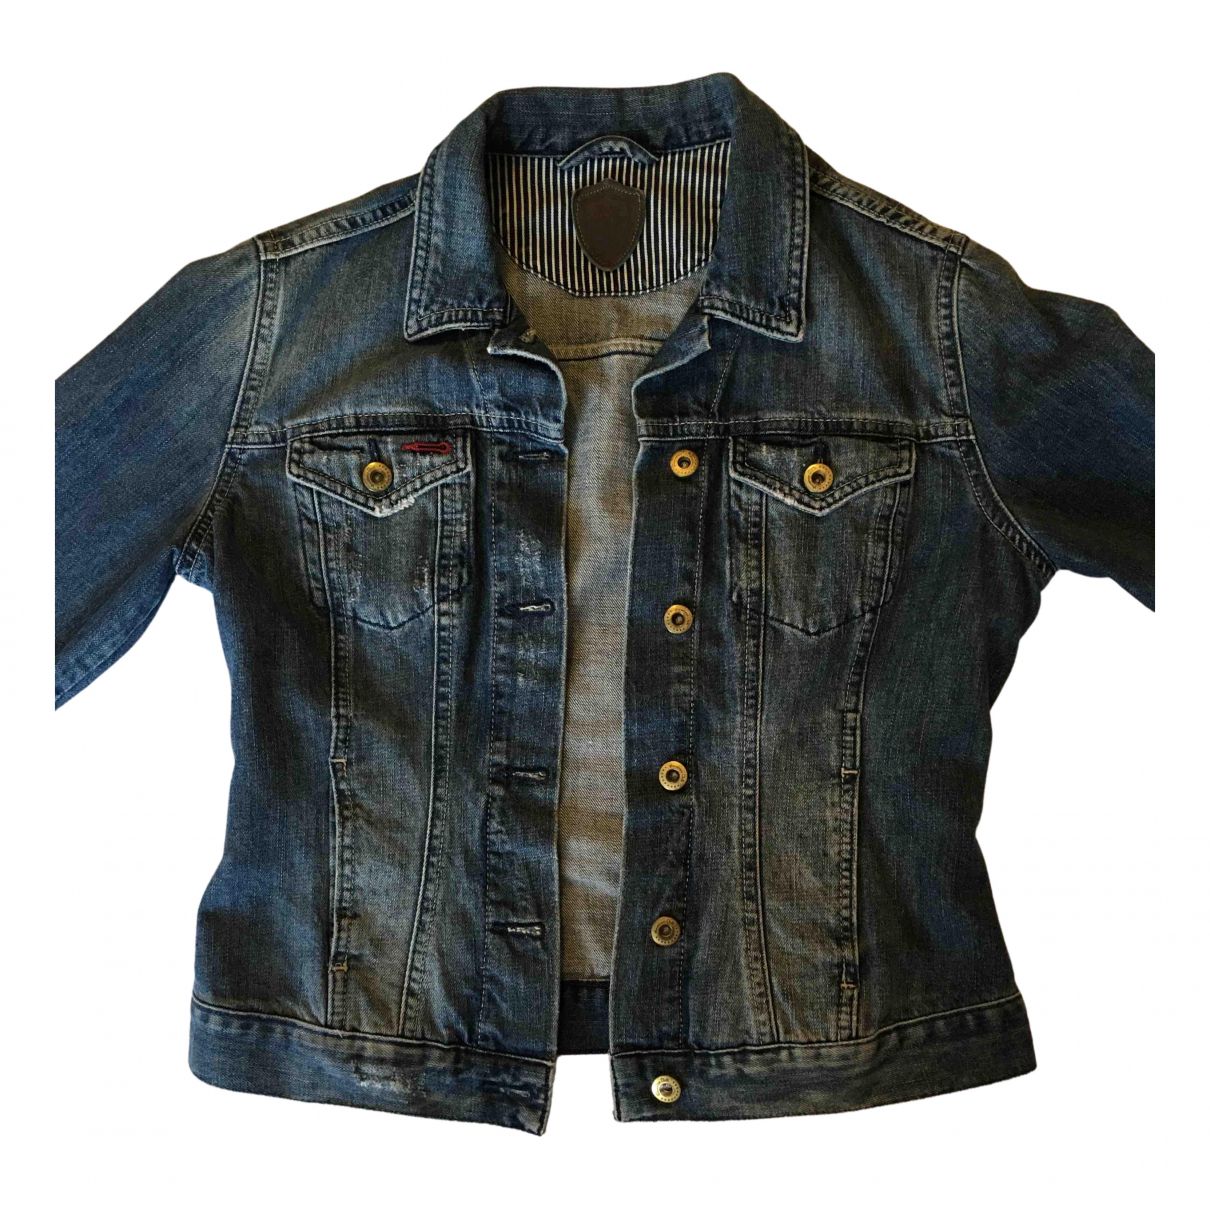 Massimo Dutti \N Jacke in  Blau Denim - Jeans